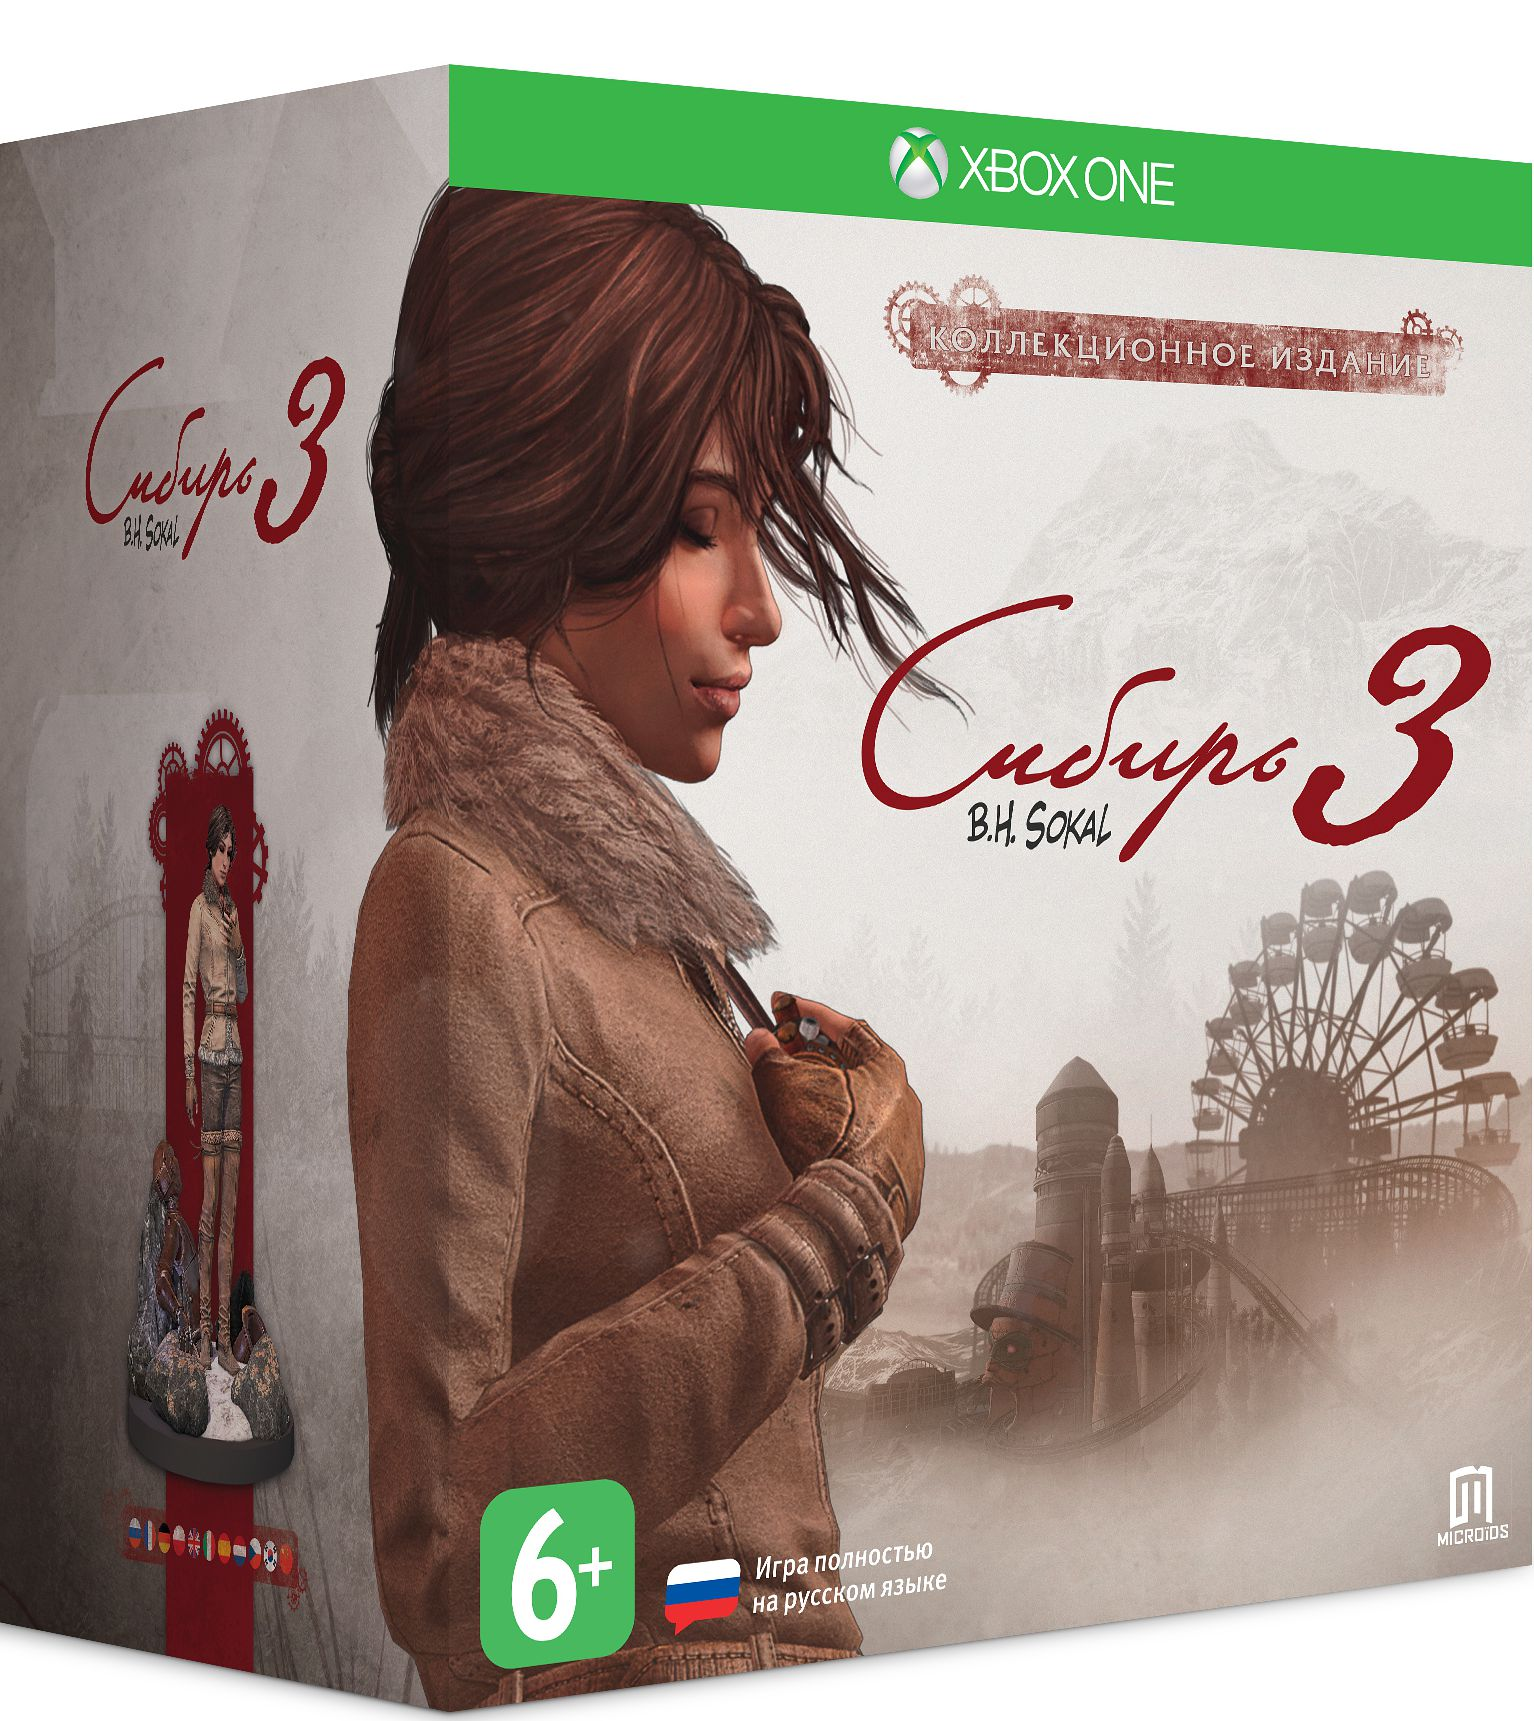 Сибирь 3. Коллекционное издание [Xbox One] pcdvd сибирь 3 ки медиа pcdvd сибирь 3 ки